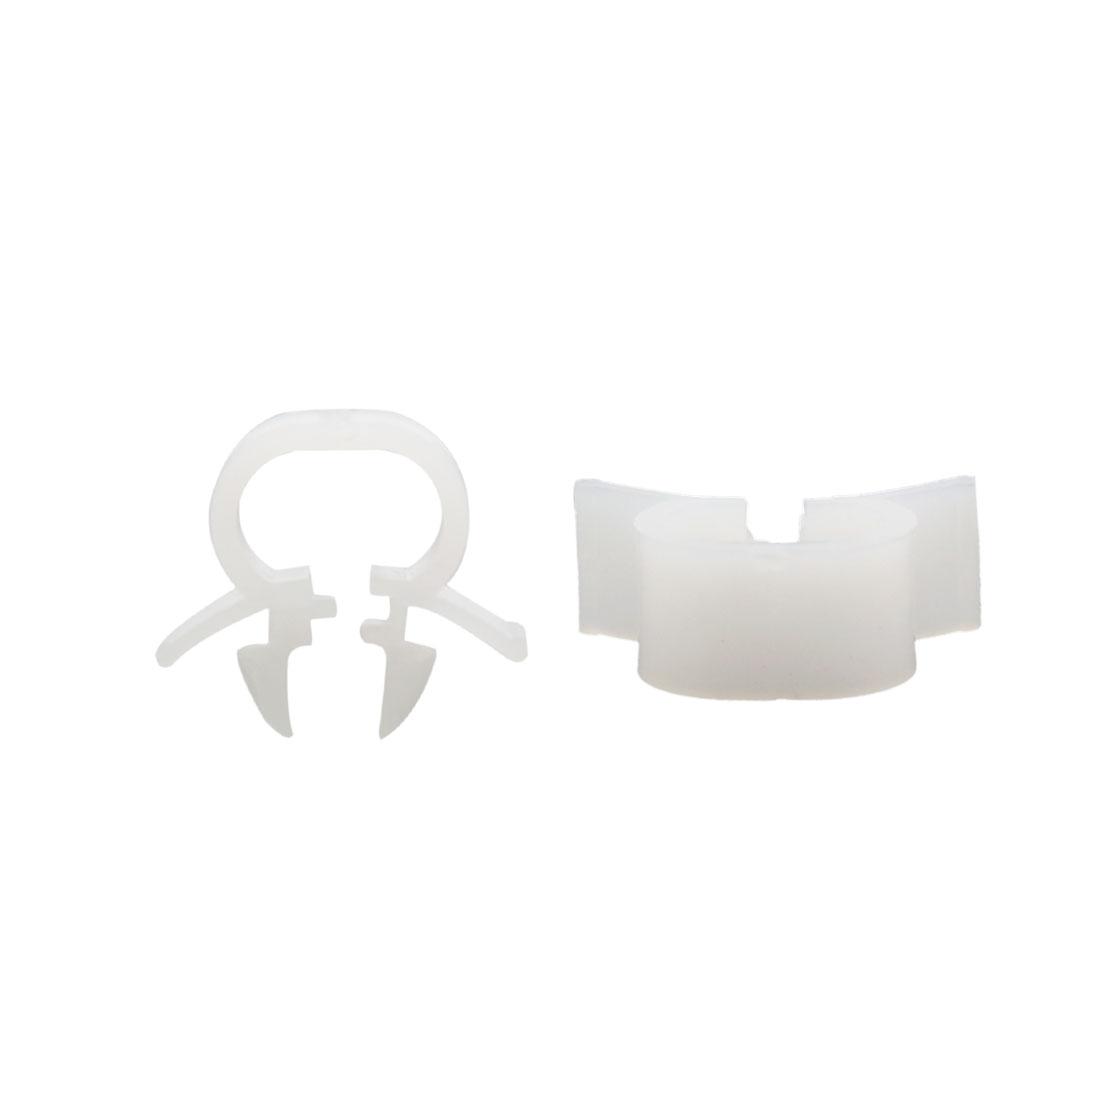 100Pcs White Plastic Rivets Interior Carpet Floor Mat Arch Clips 11mm for Car